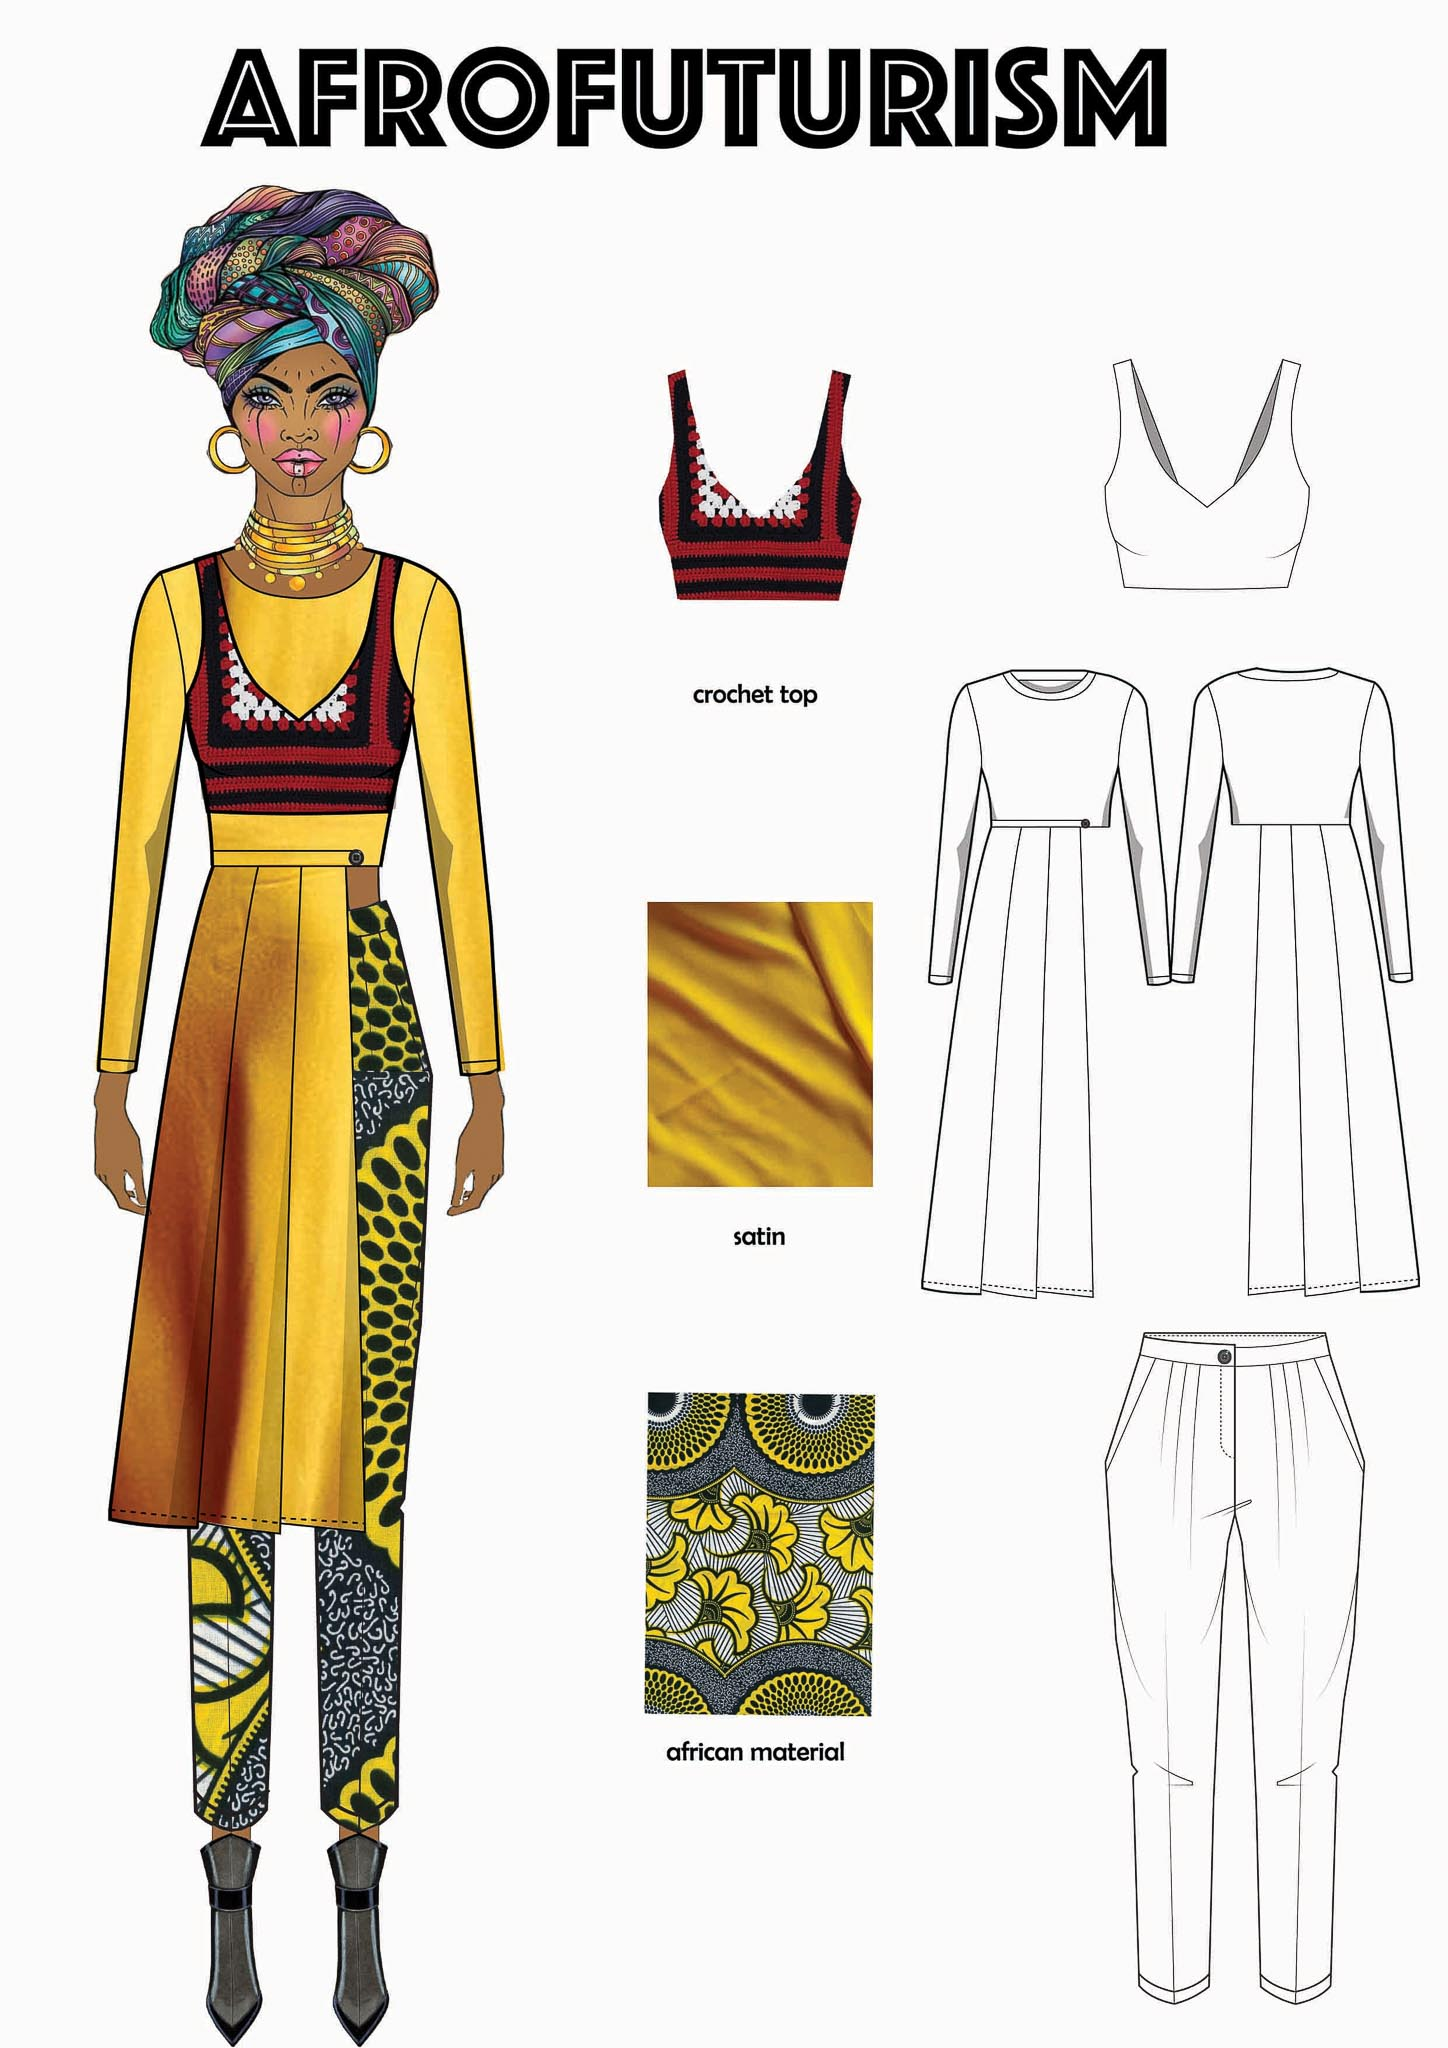 Afrofuturism: Esther Asemba Deagbo, Kongo, Student, Design Academy of Fashion (Create your Revolution)